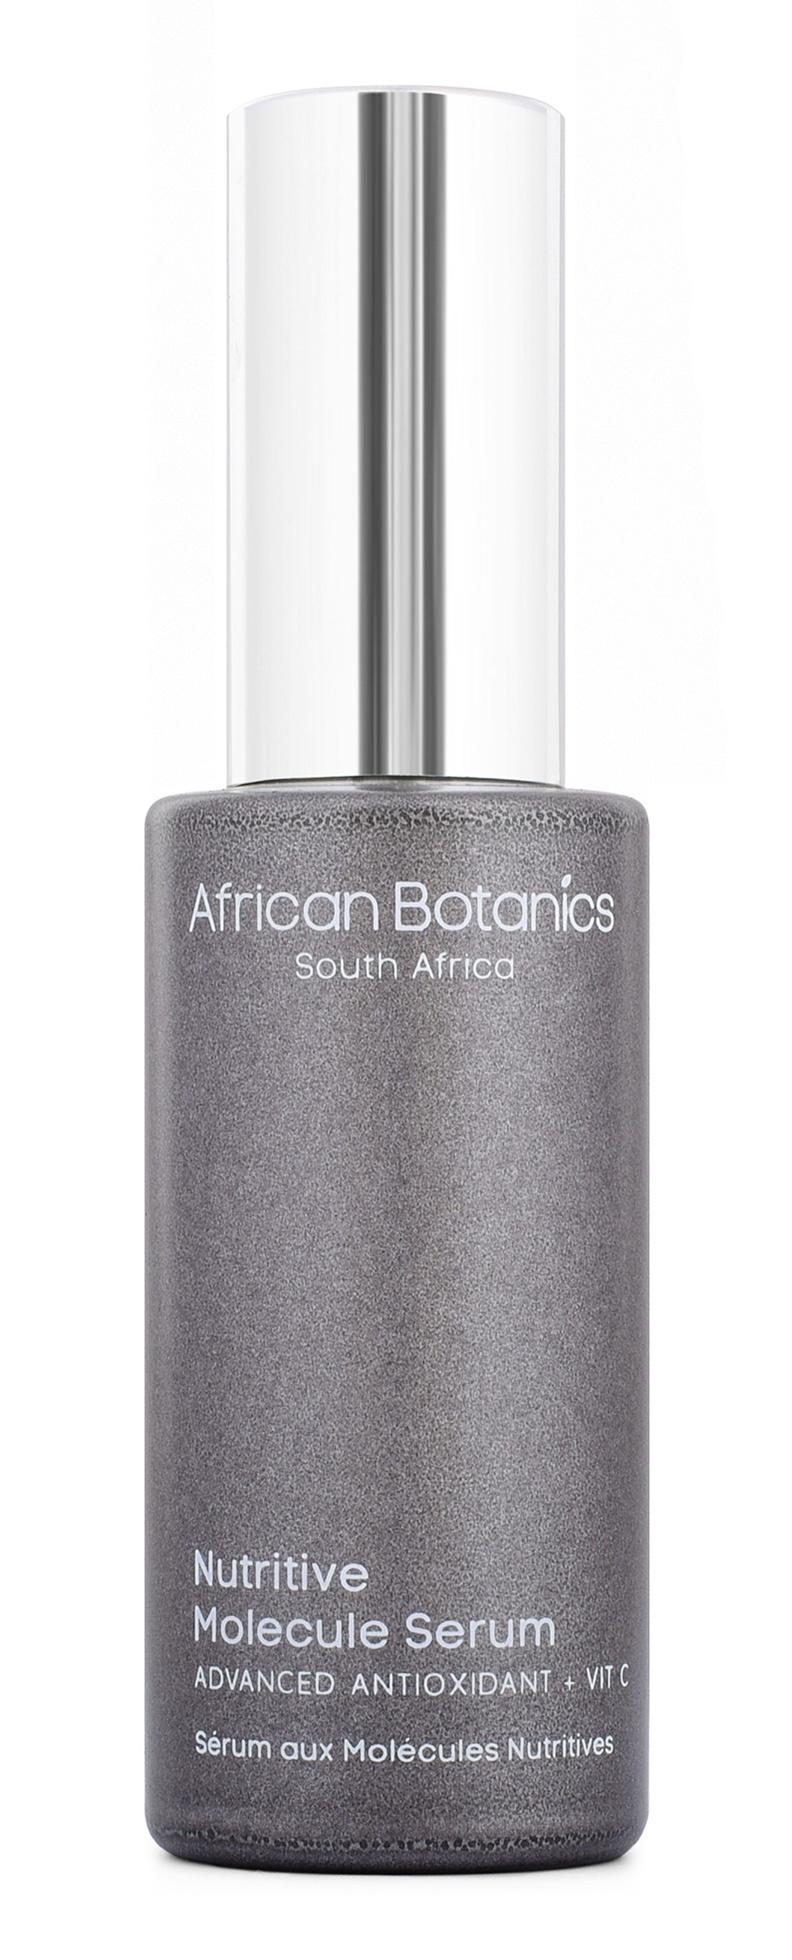 African Botanics Nutritive Molecule Serum